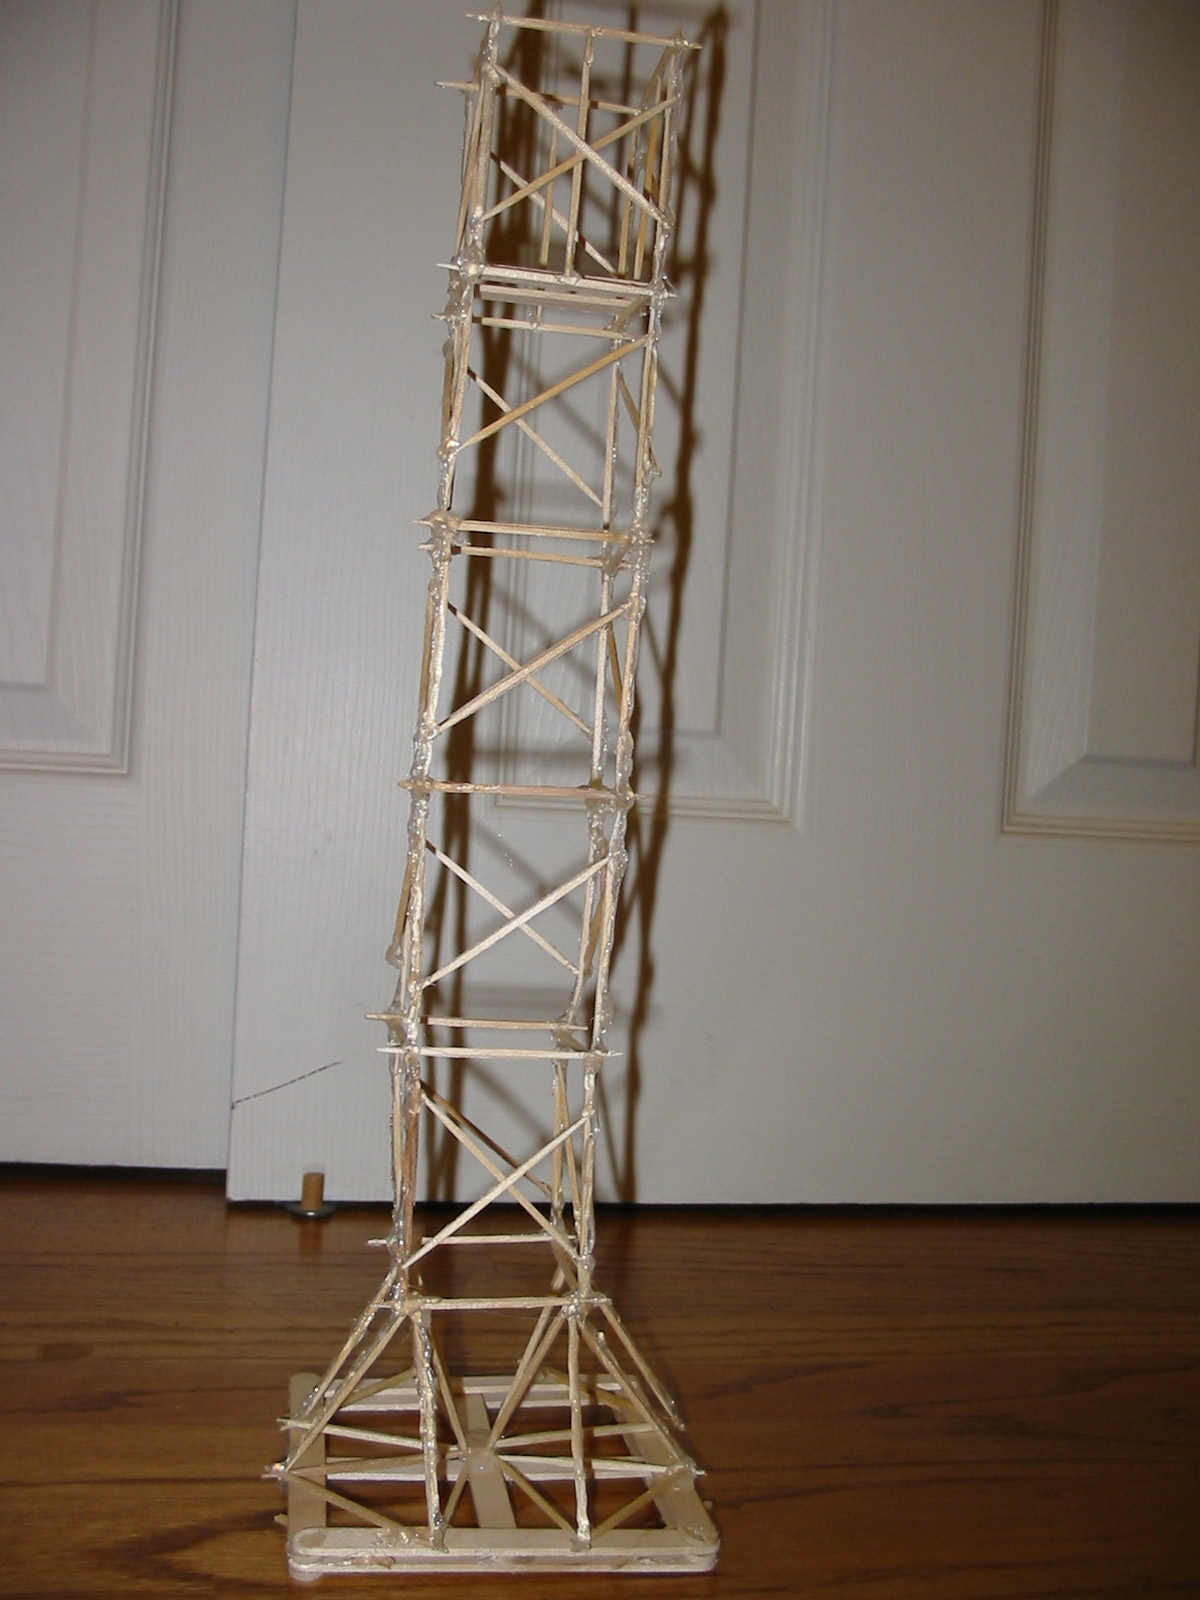 Making Earthquake Proof Tower